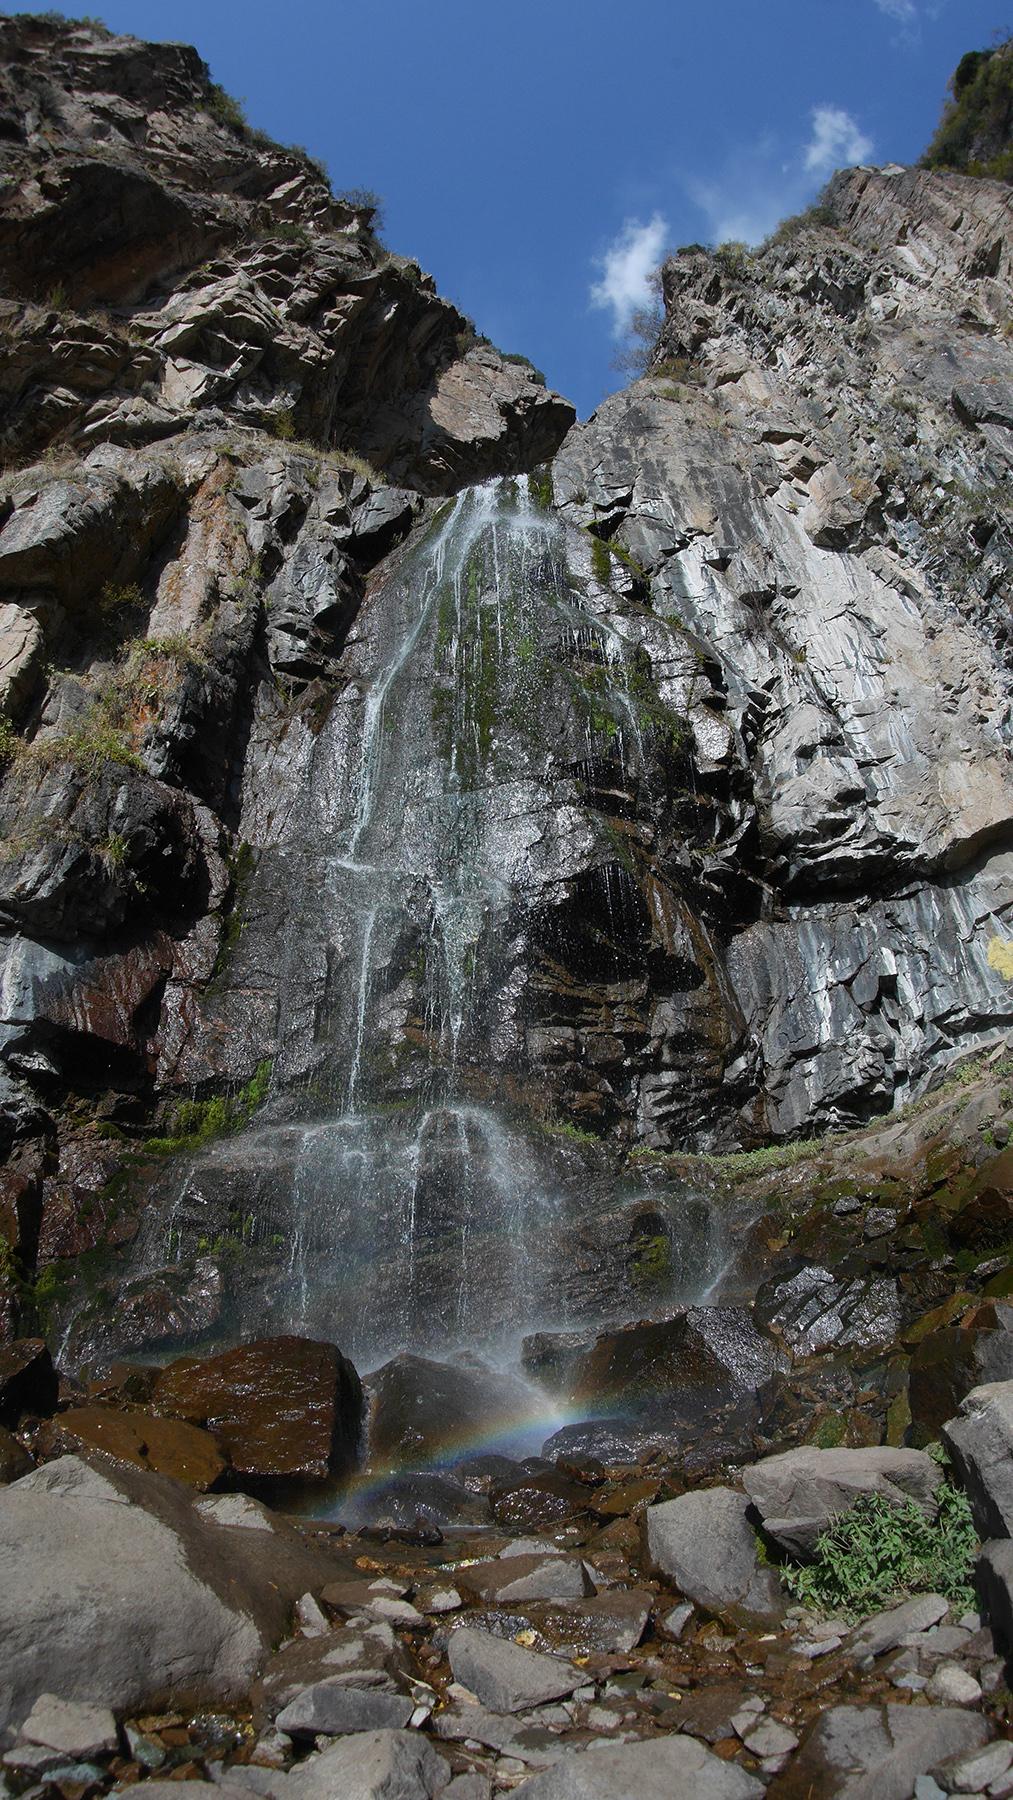 The Butakovka Waterfall